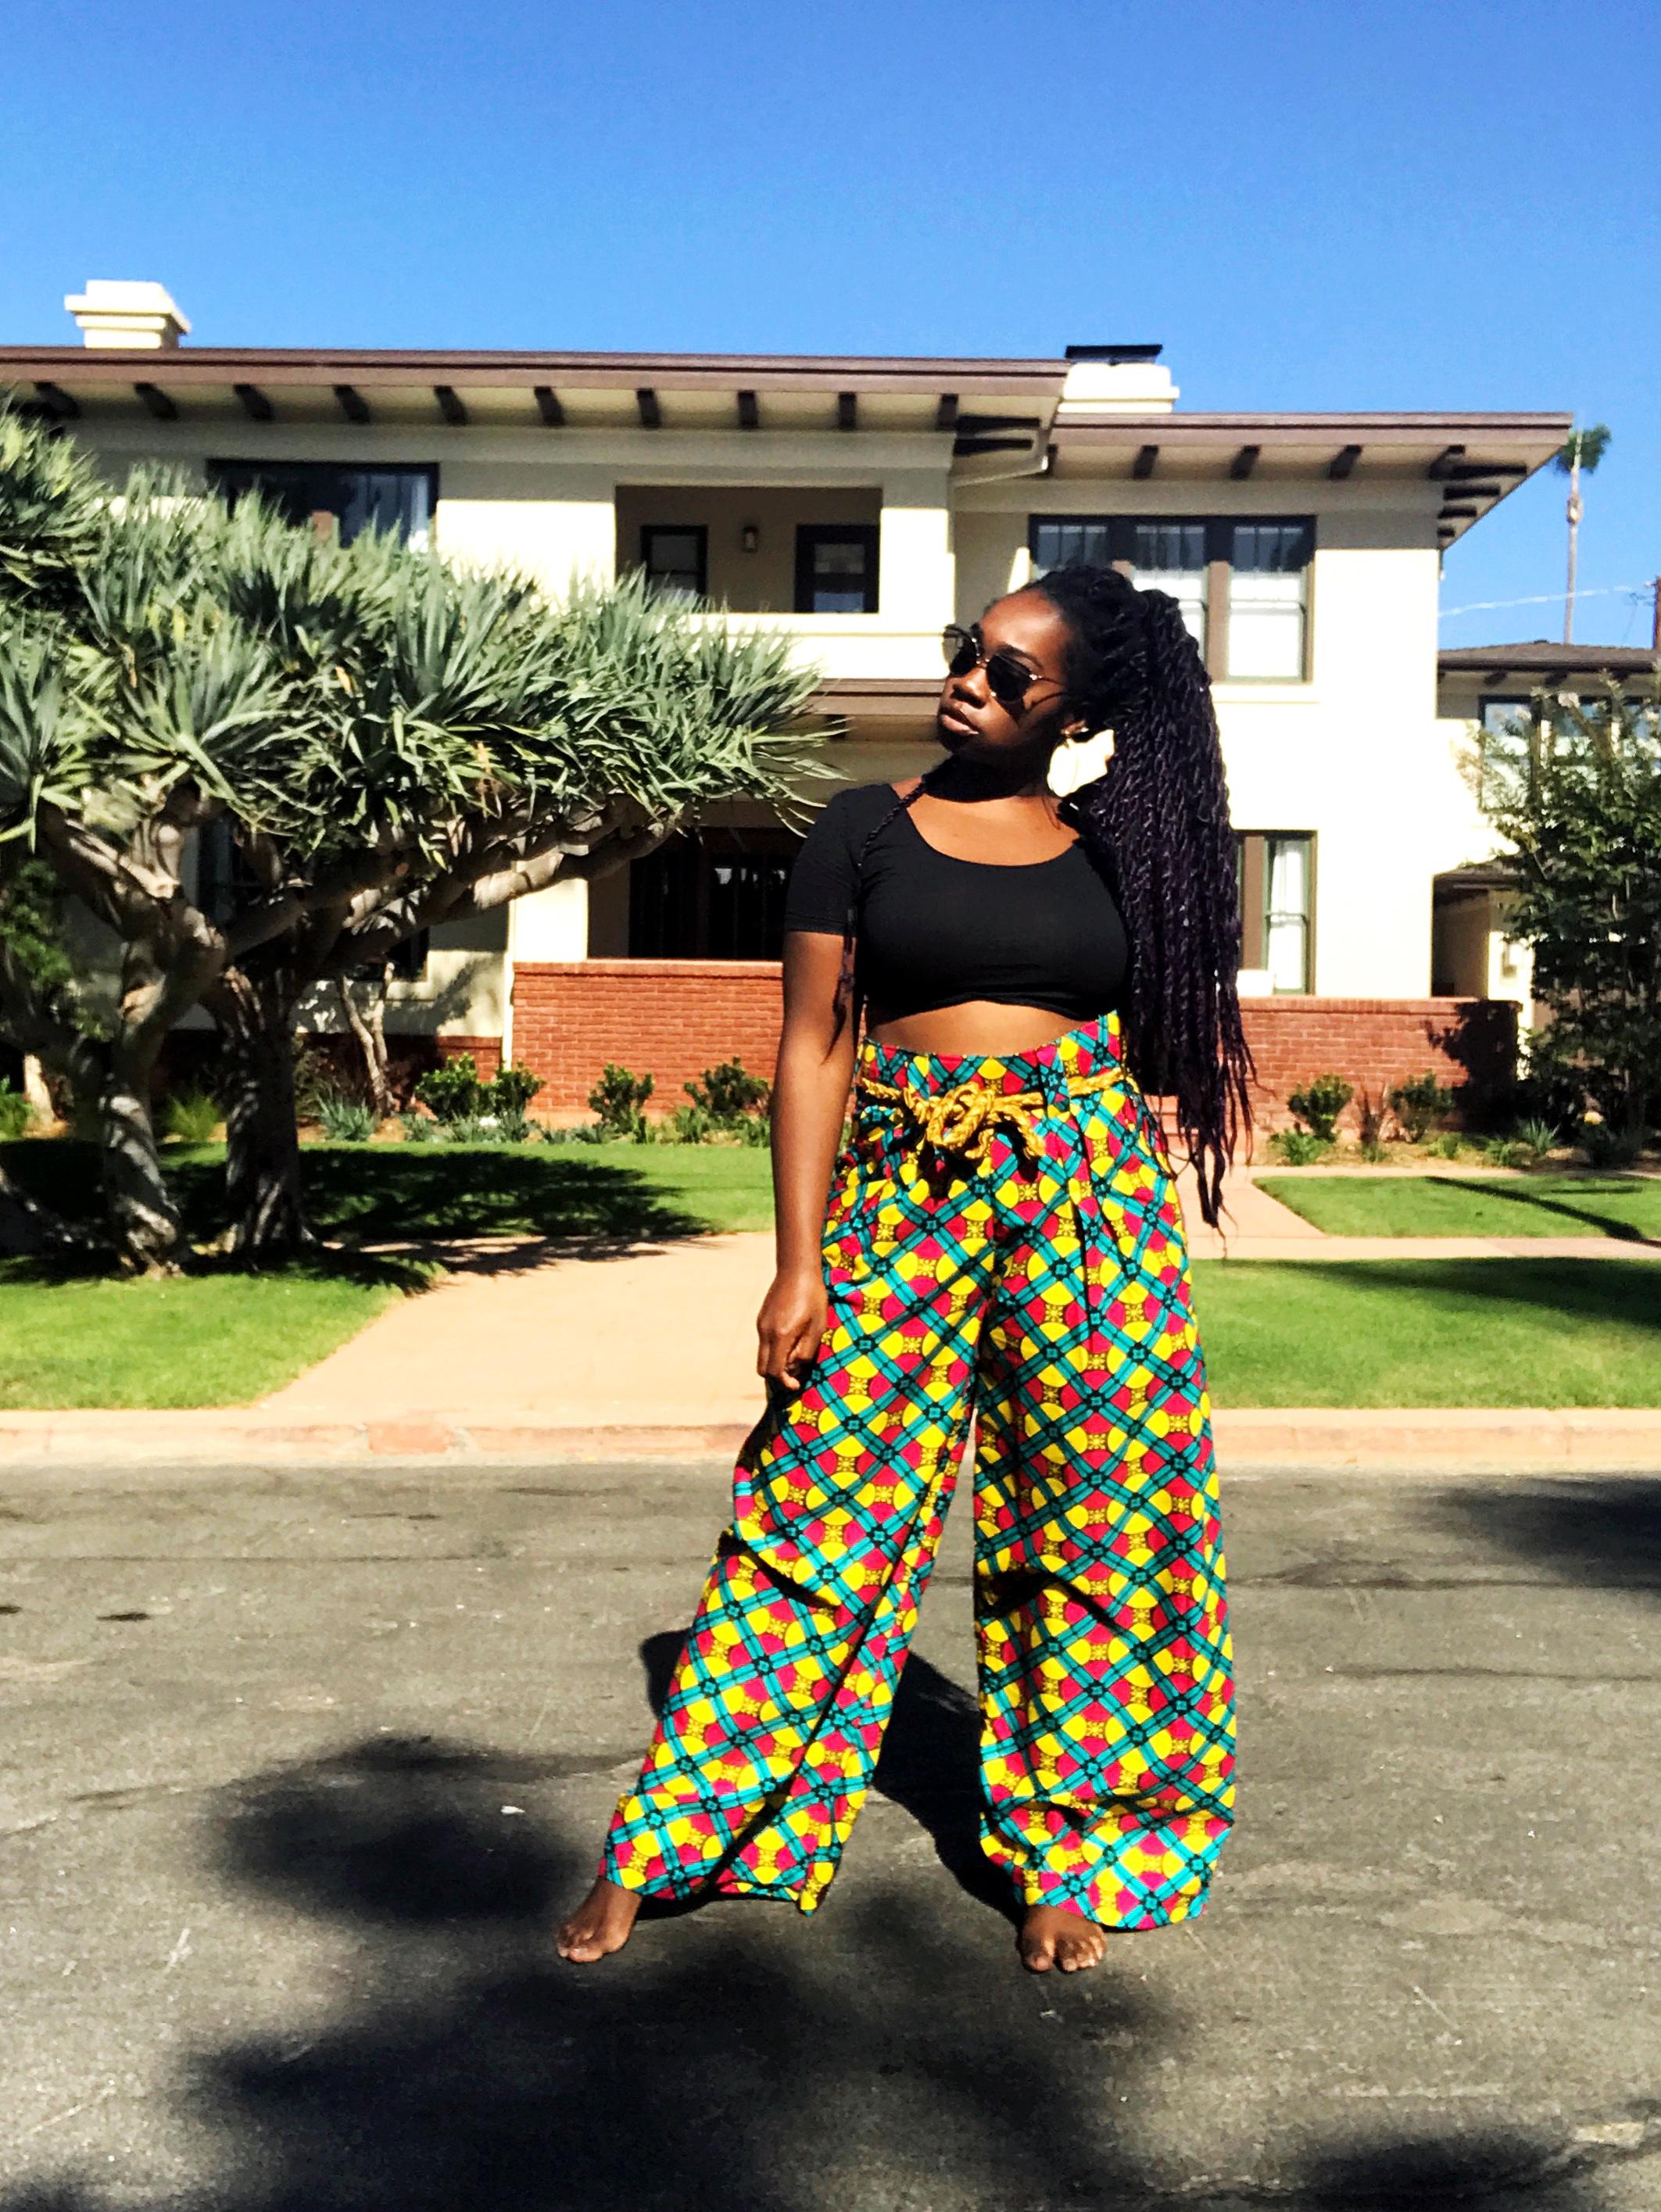 Femi wearing African print wide leg pants and black crop top standing in the street